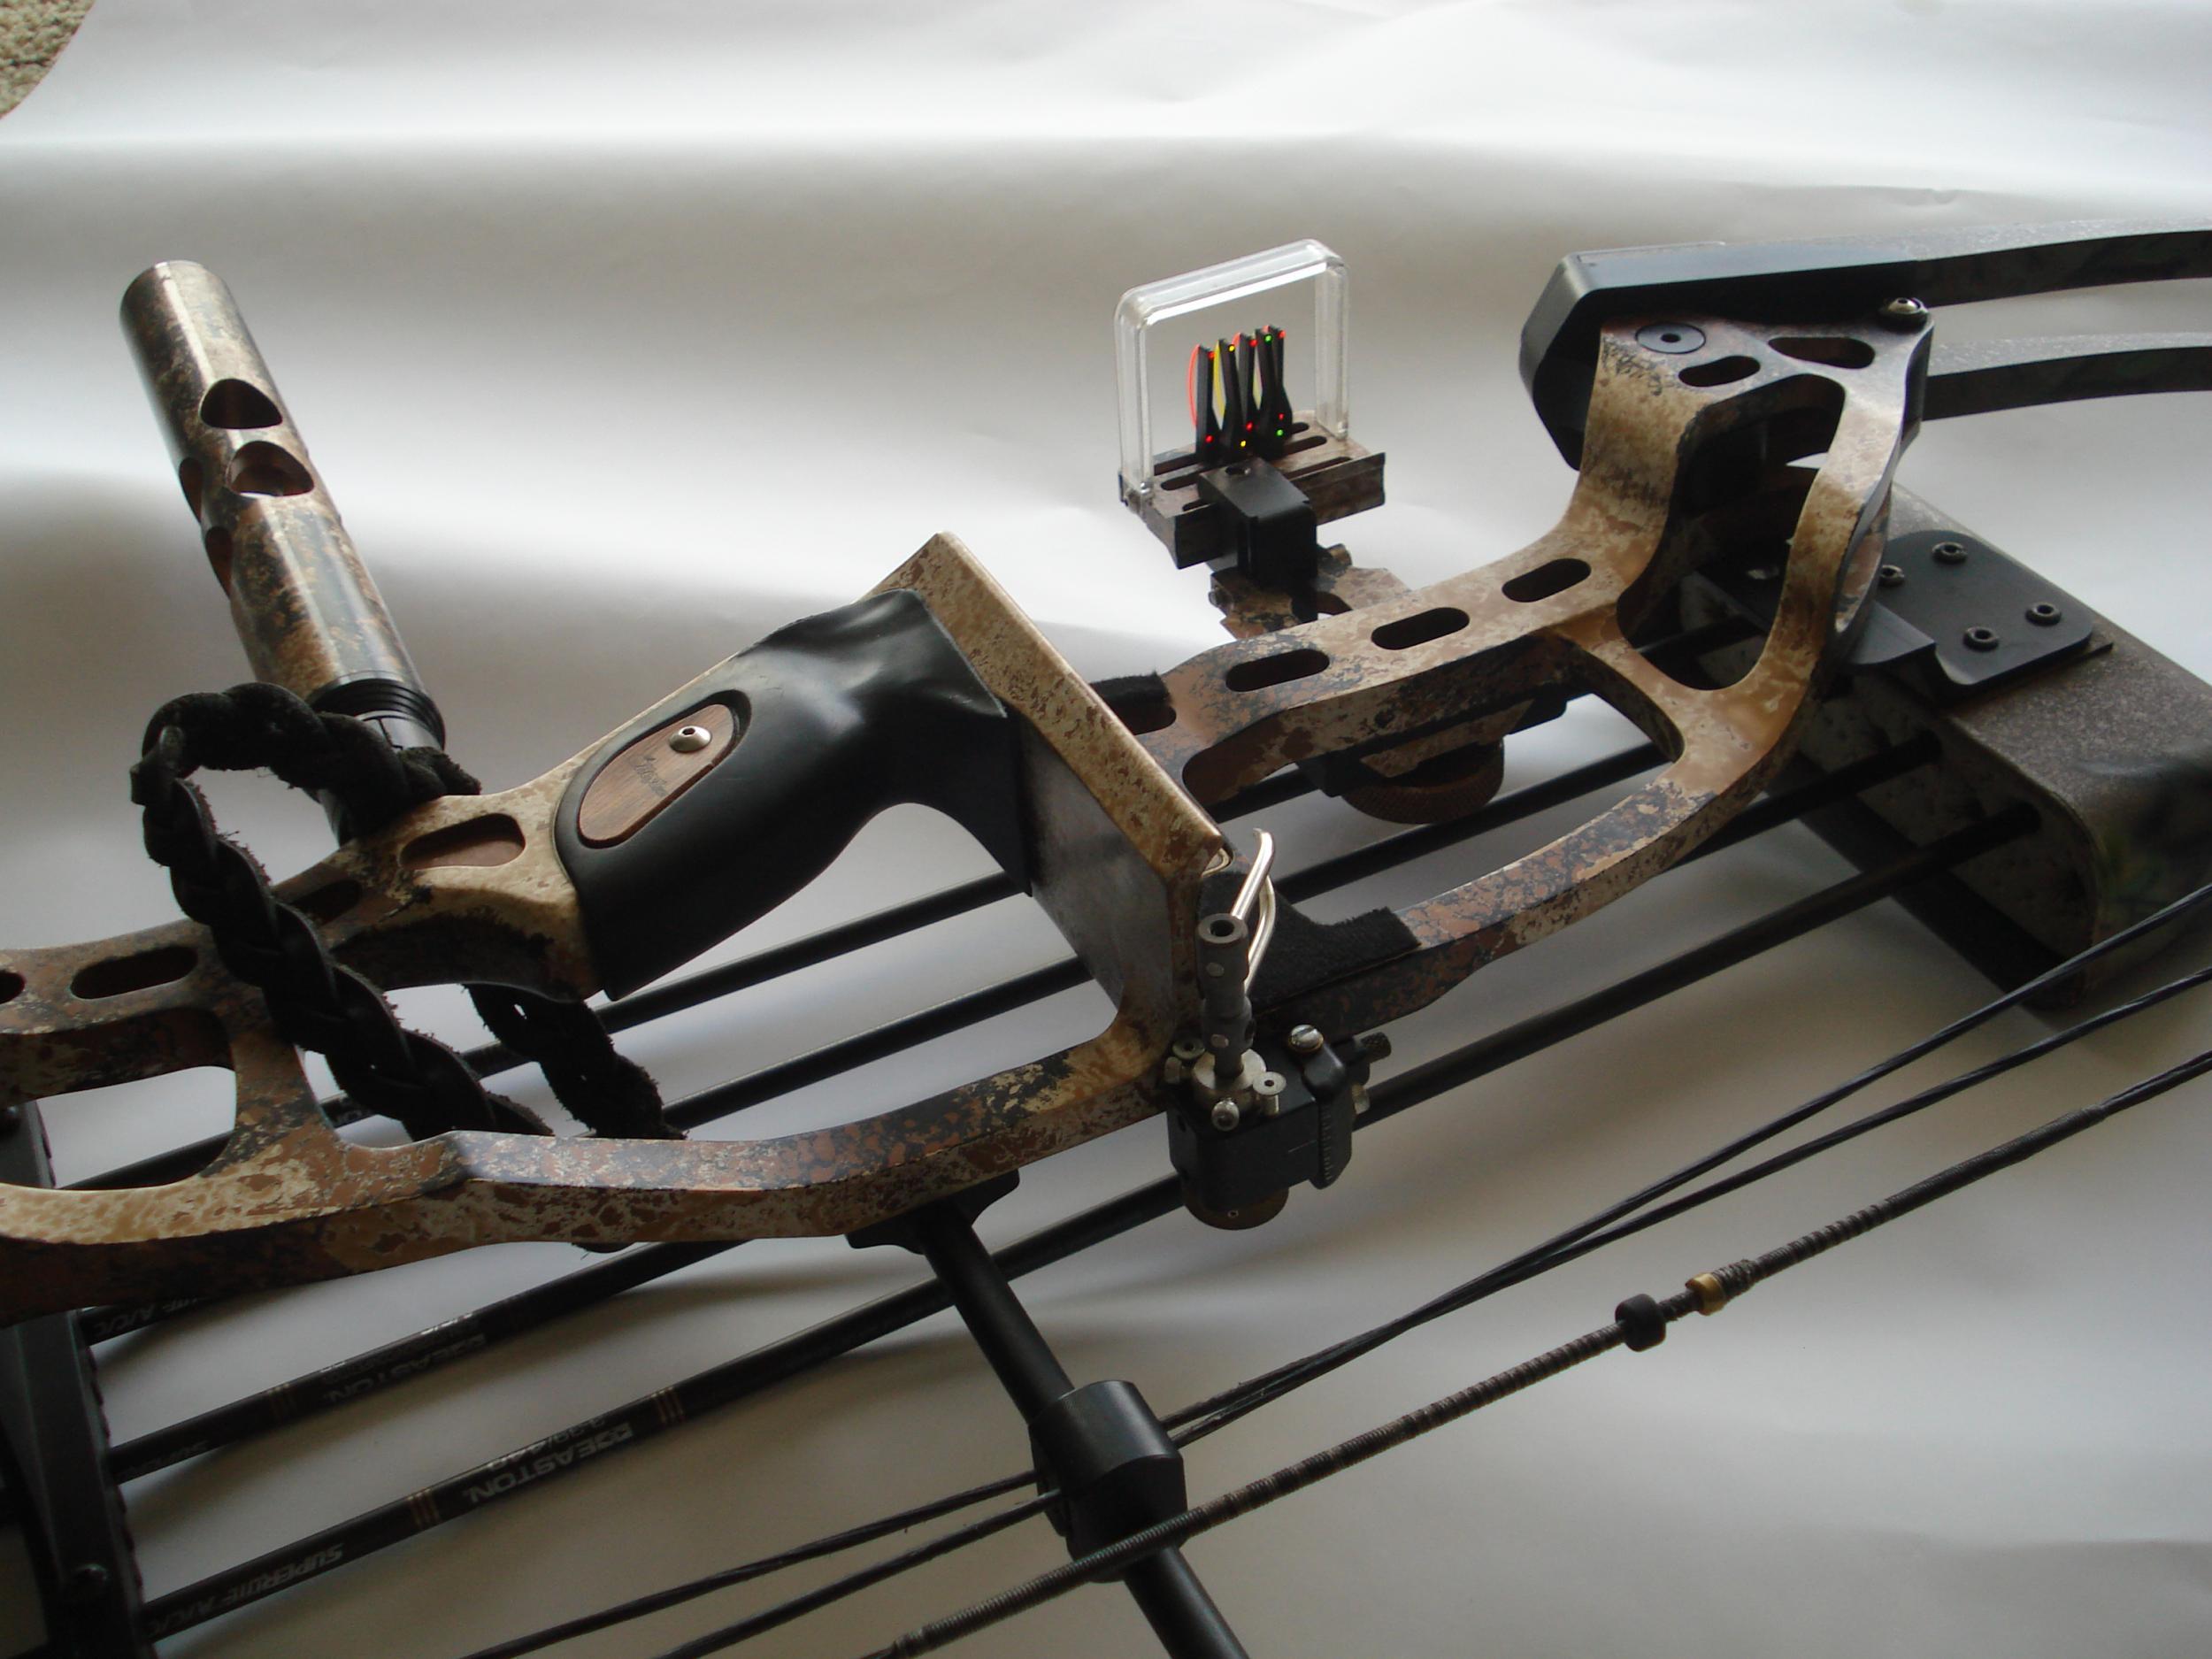 Hoyt Archery Wallpaper Archery bow wallpaper 2500x1875